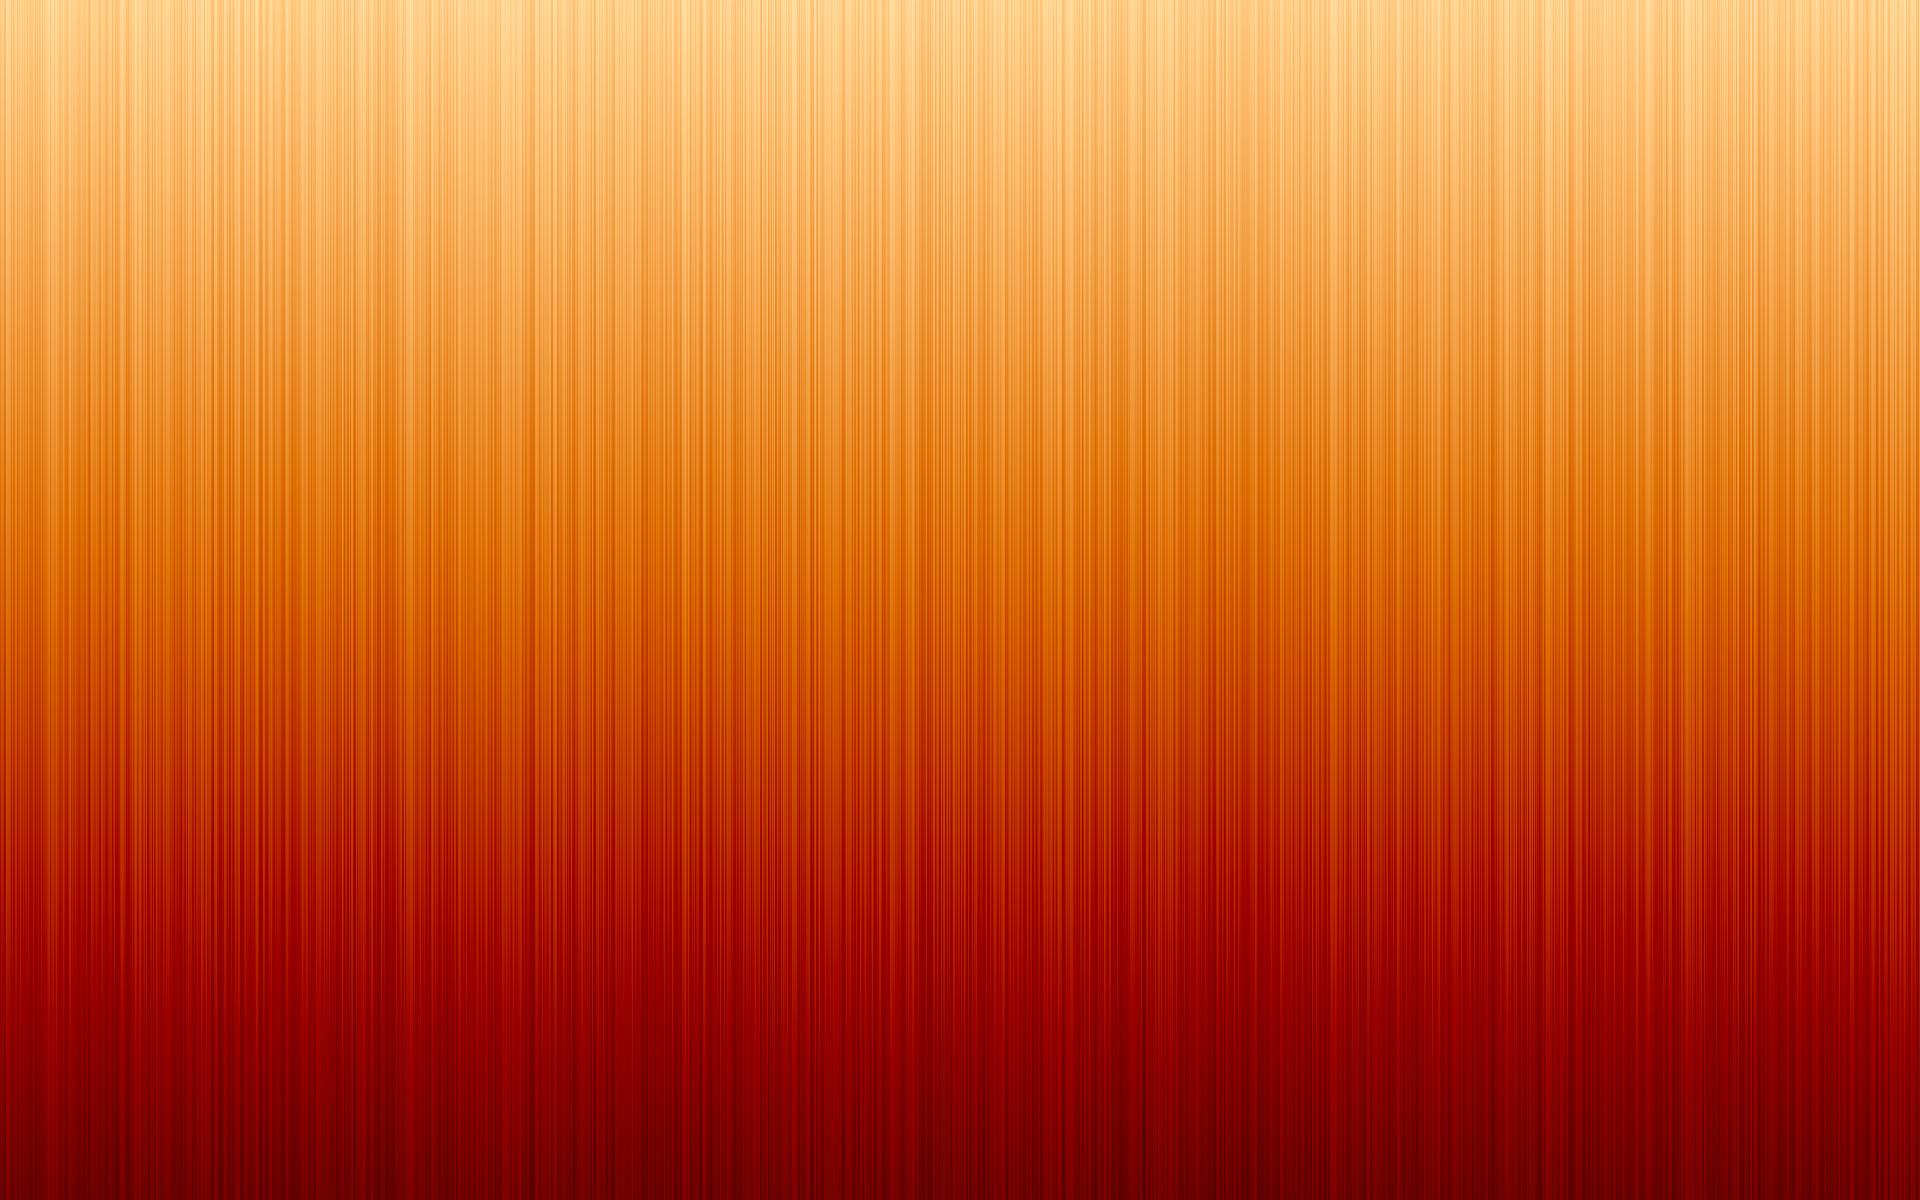 30 HD Orange Wallpapers 1920x1200